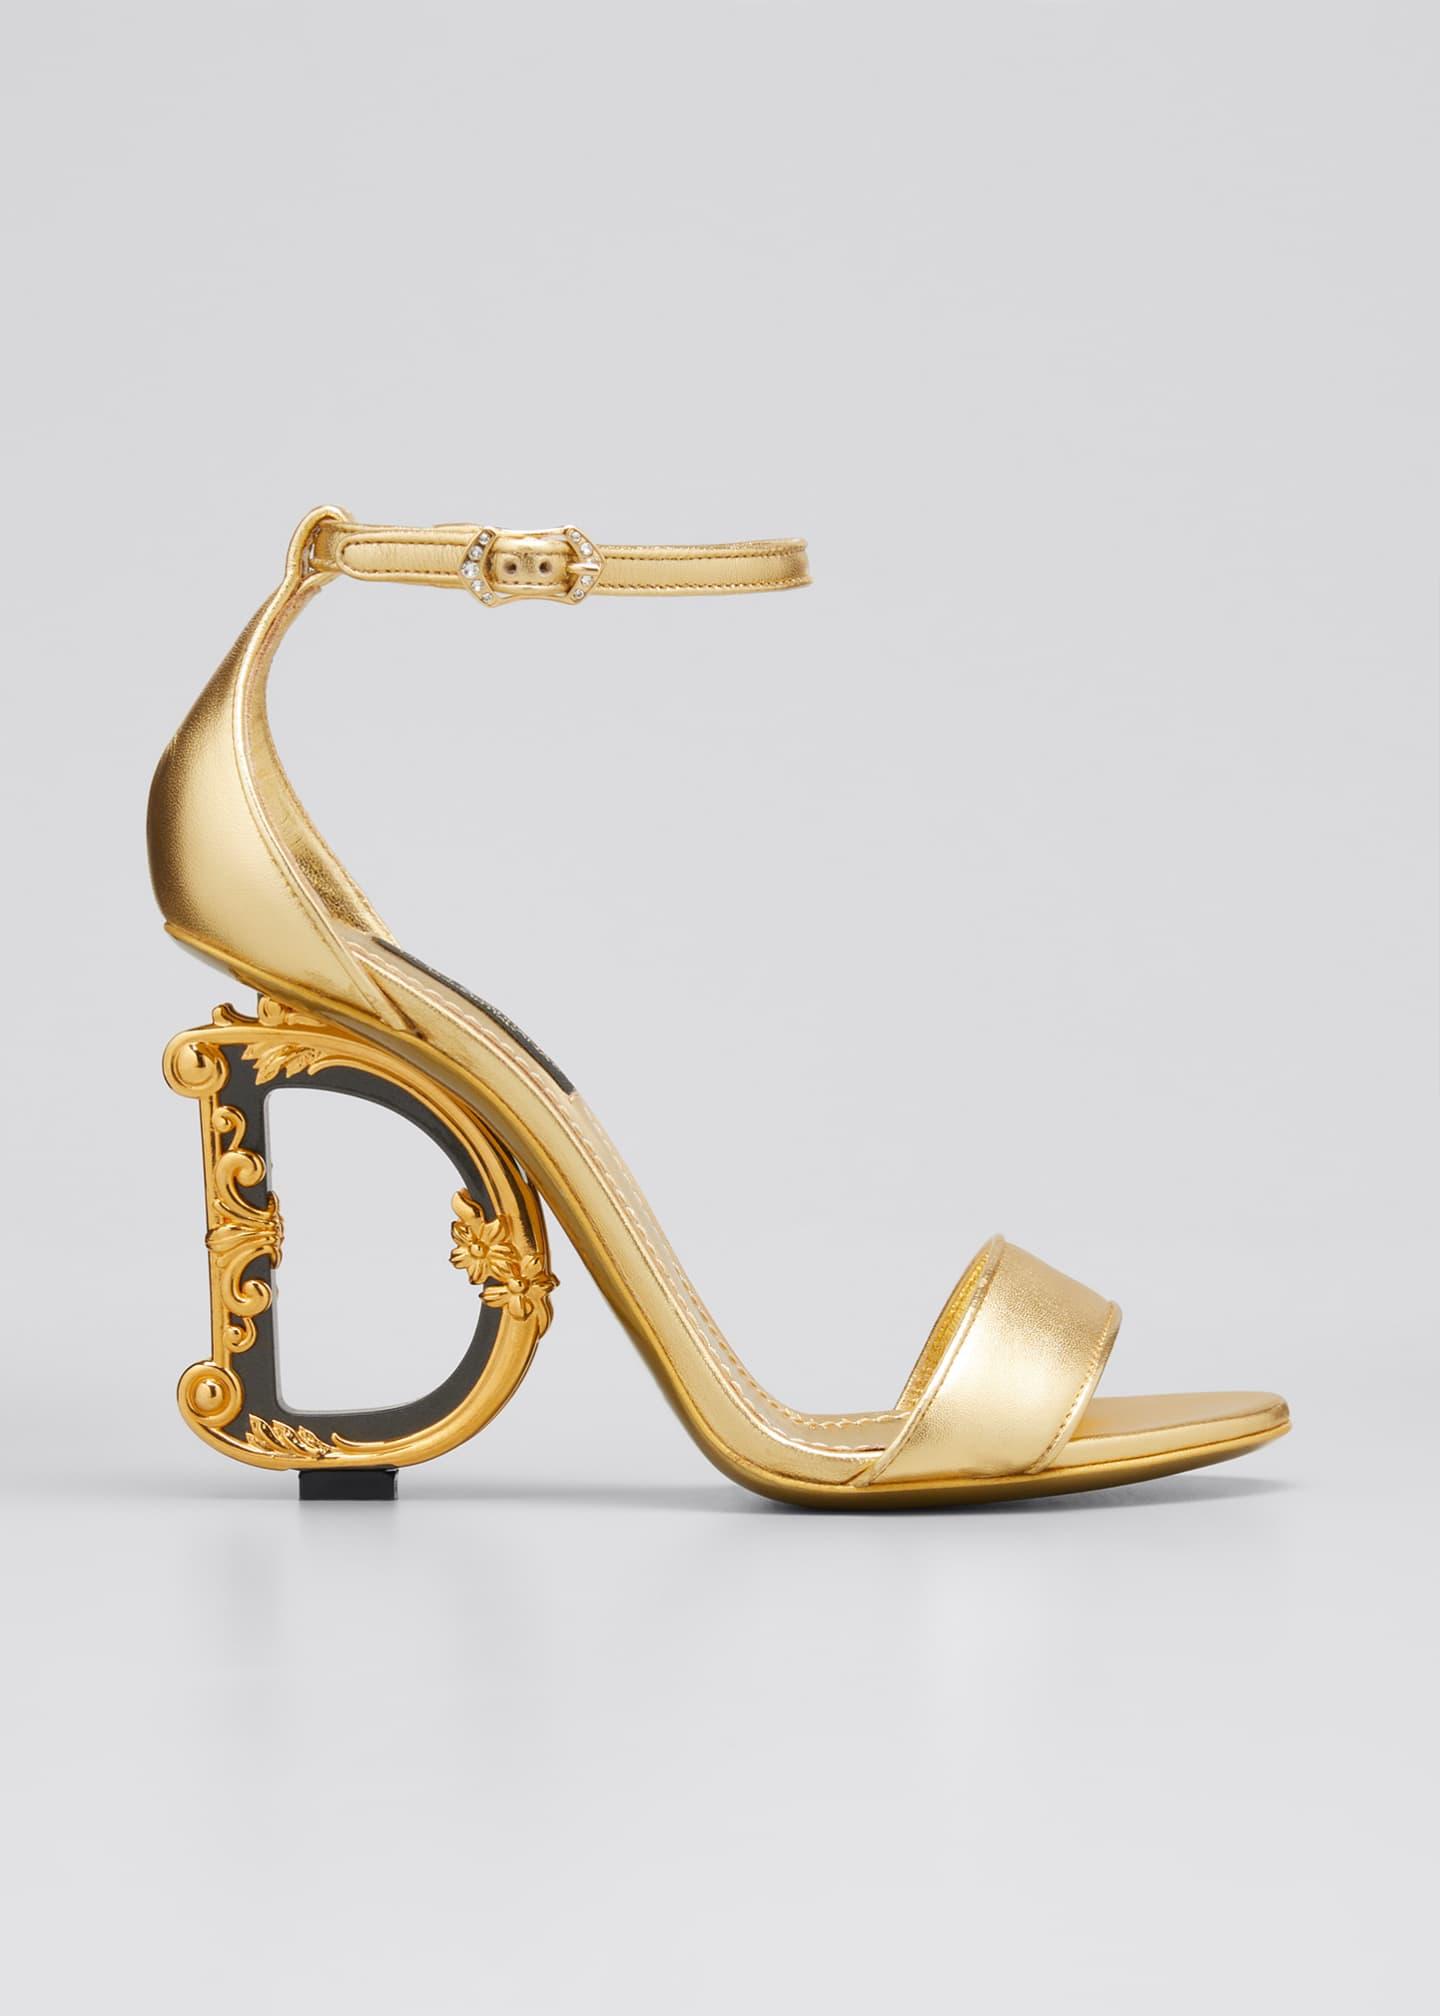 Dolce & Gabbana Metallic Fabric Sandals with Logo